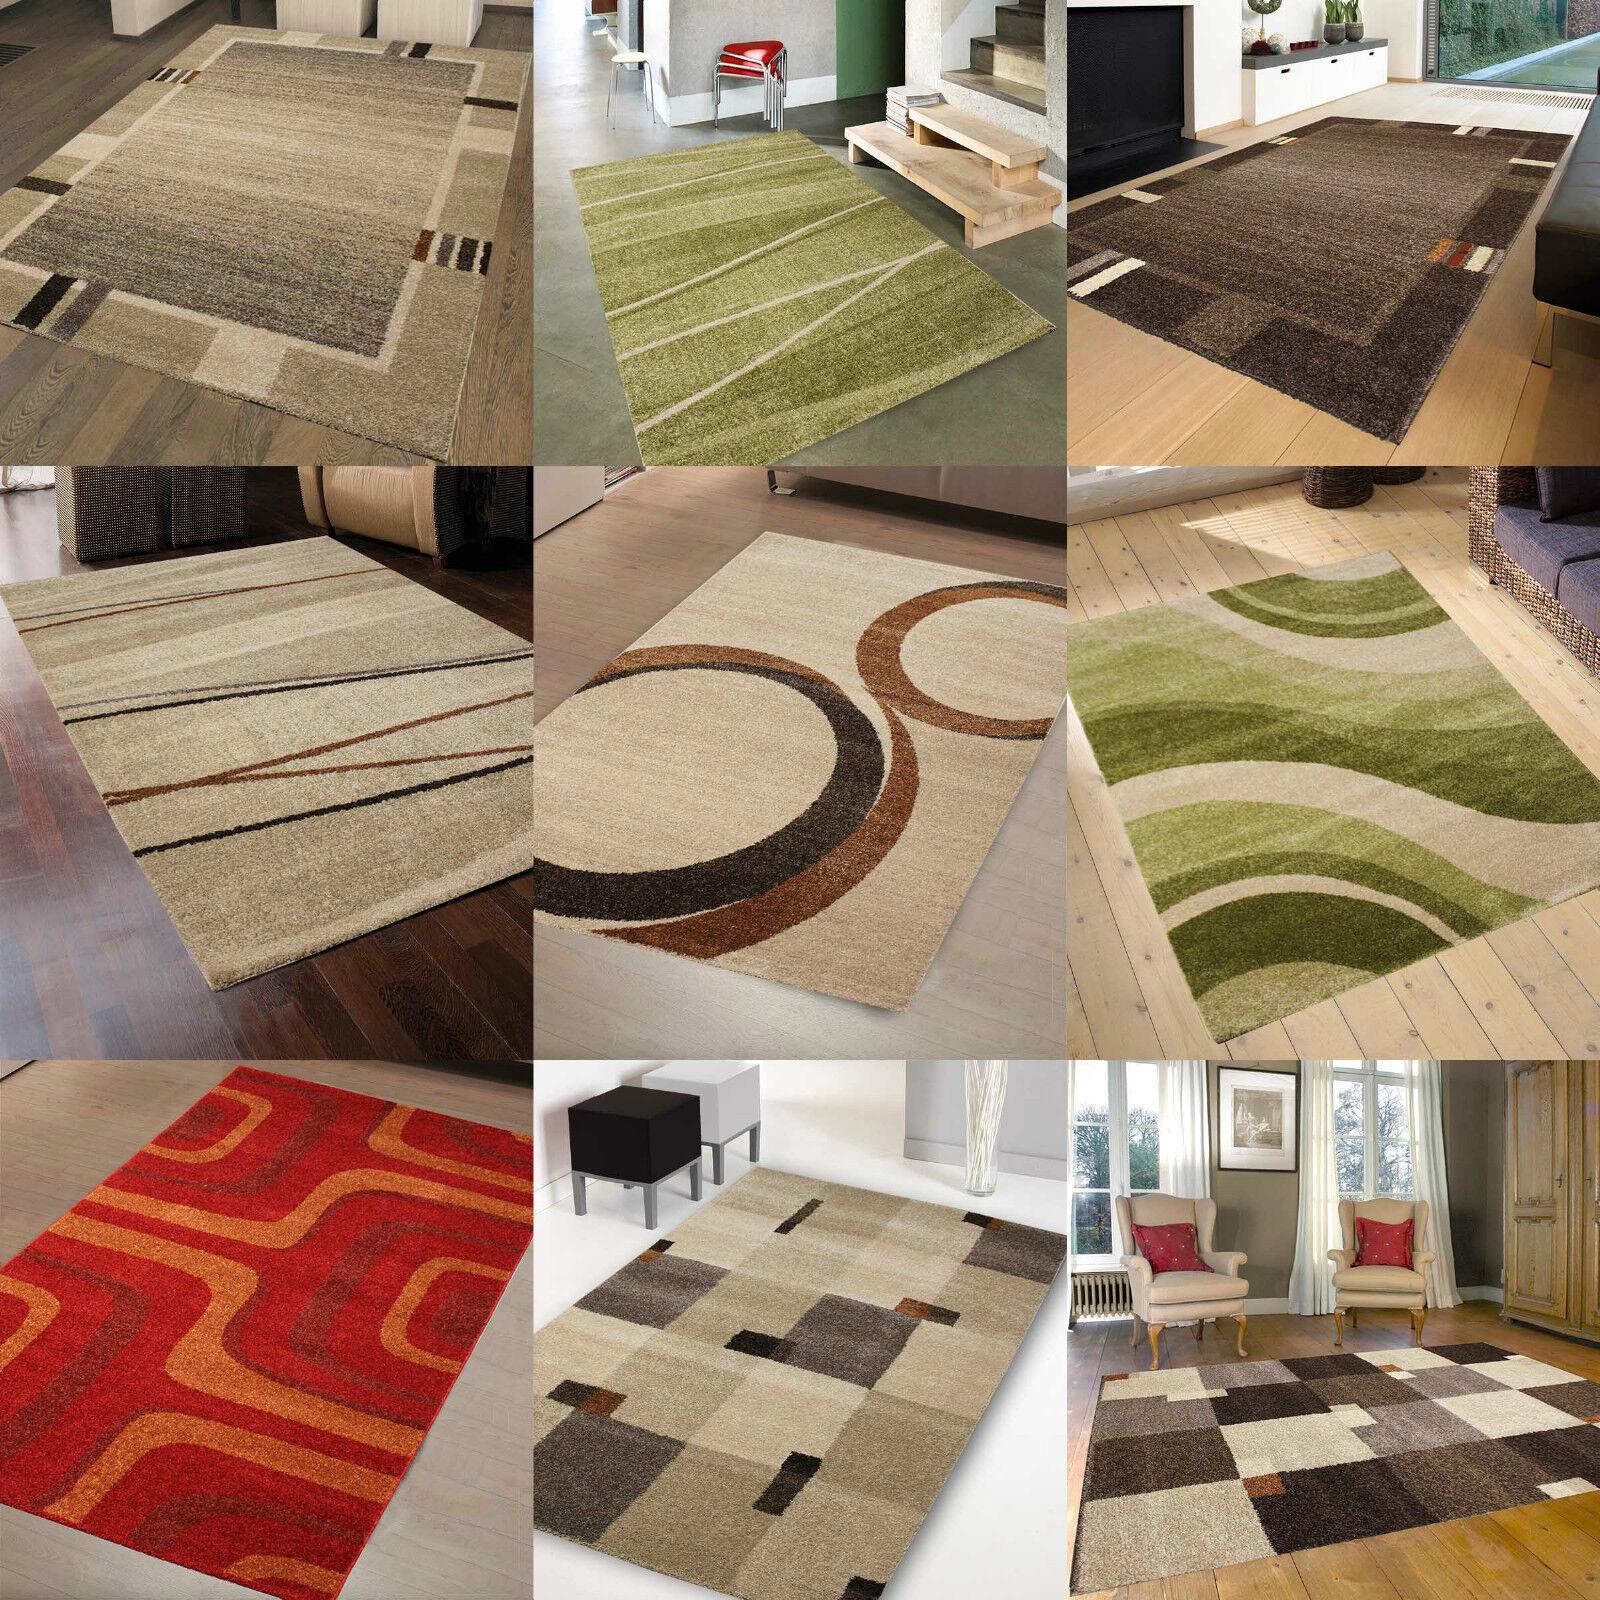 Quality Thick Modern Flooring Rugs New Mats Rug Runner